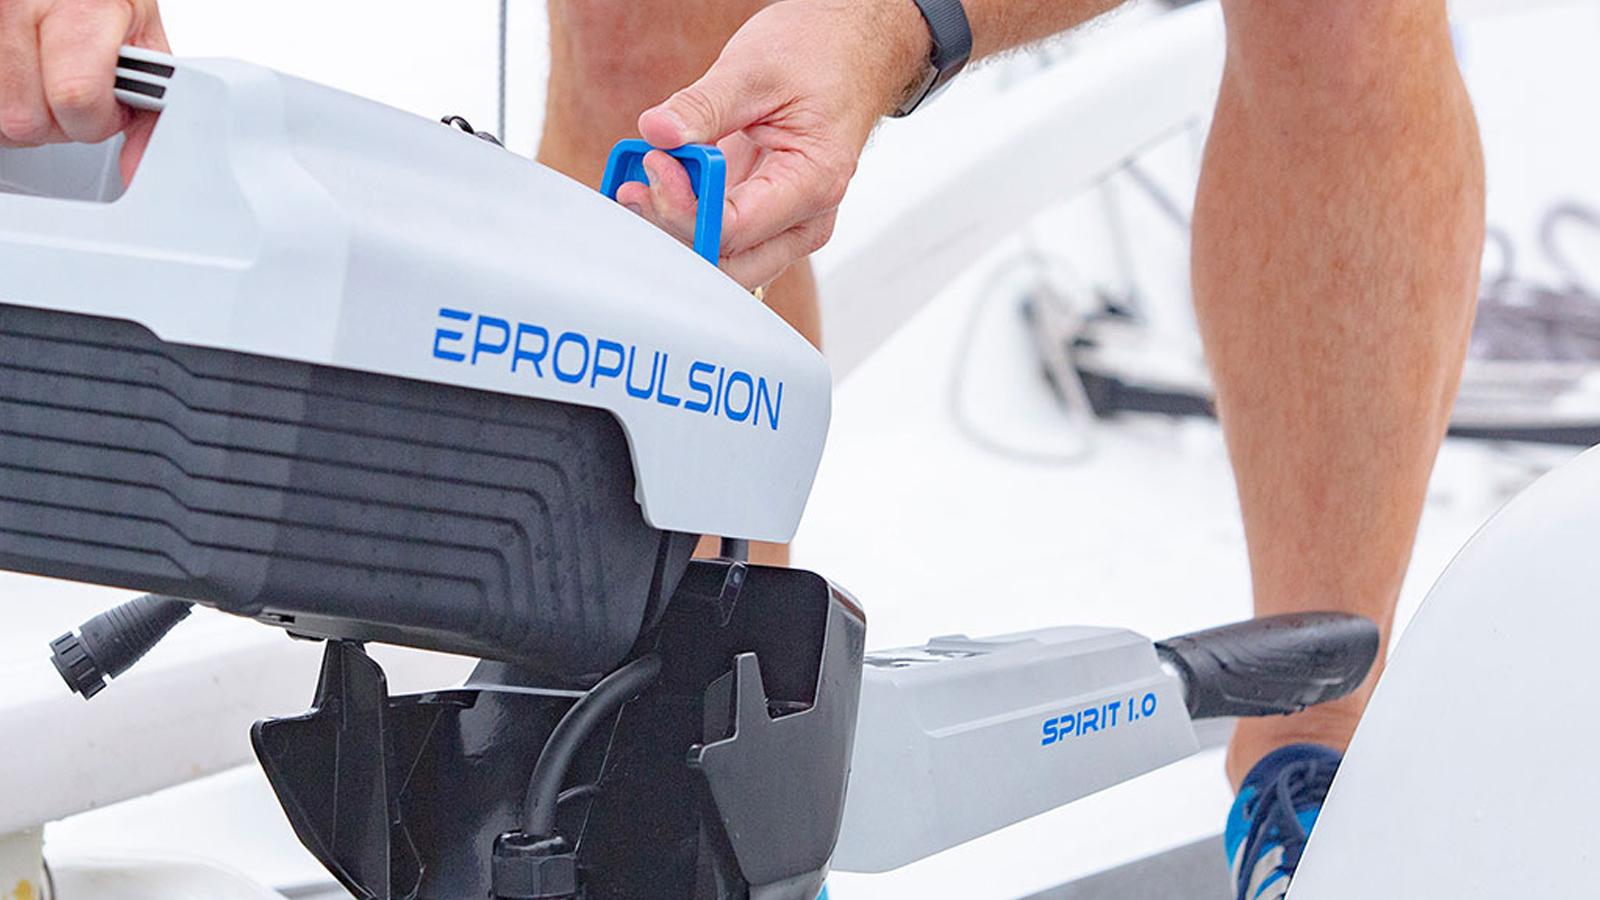 epropulsion-evo-on-board-J70